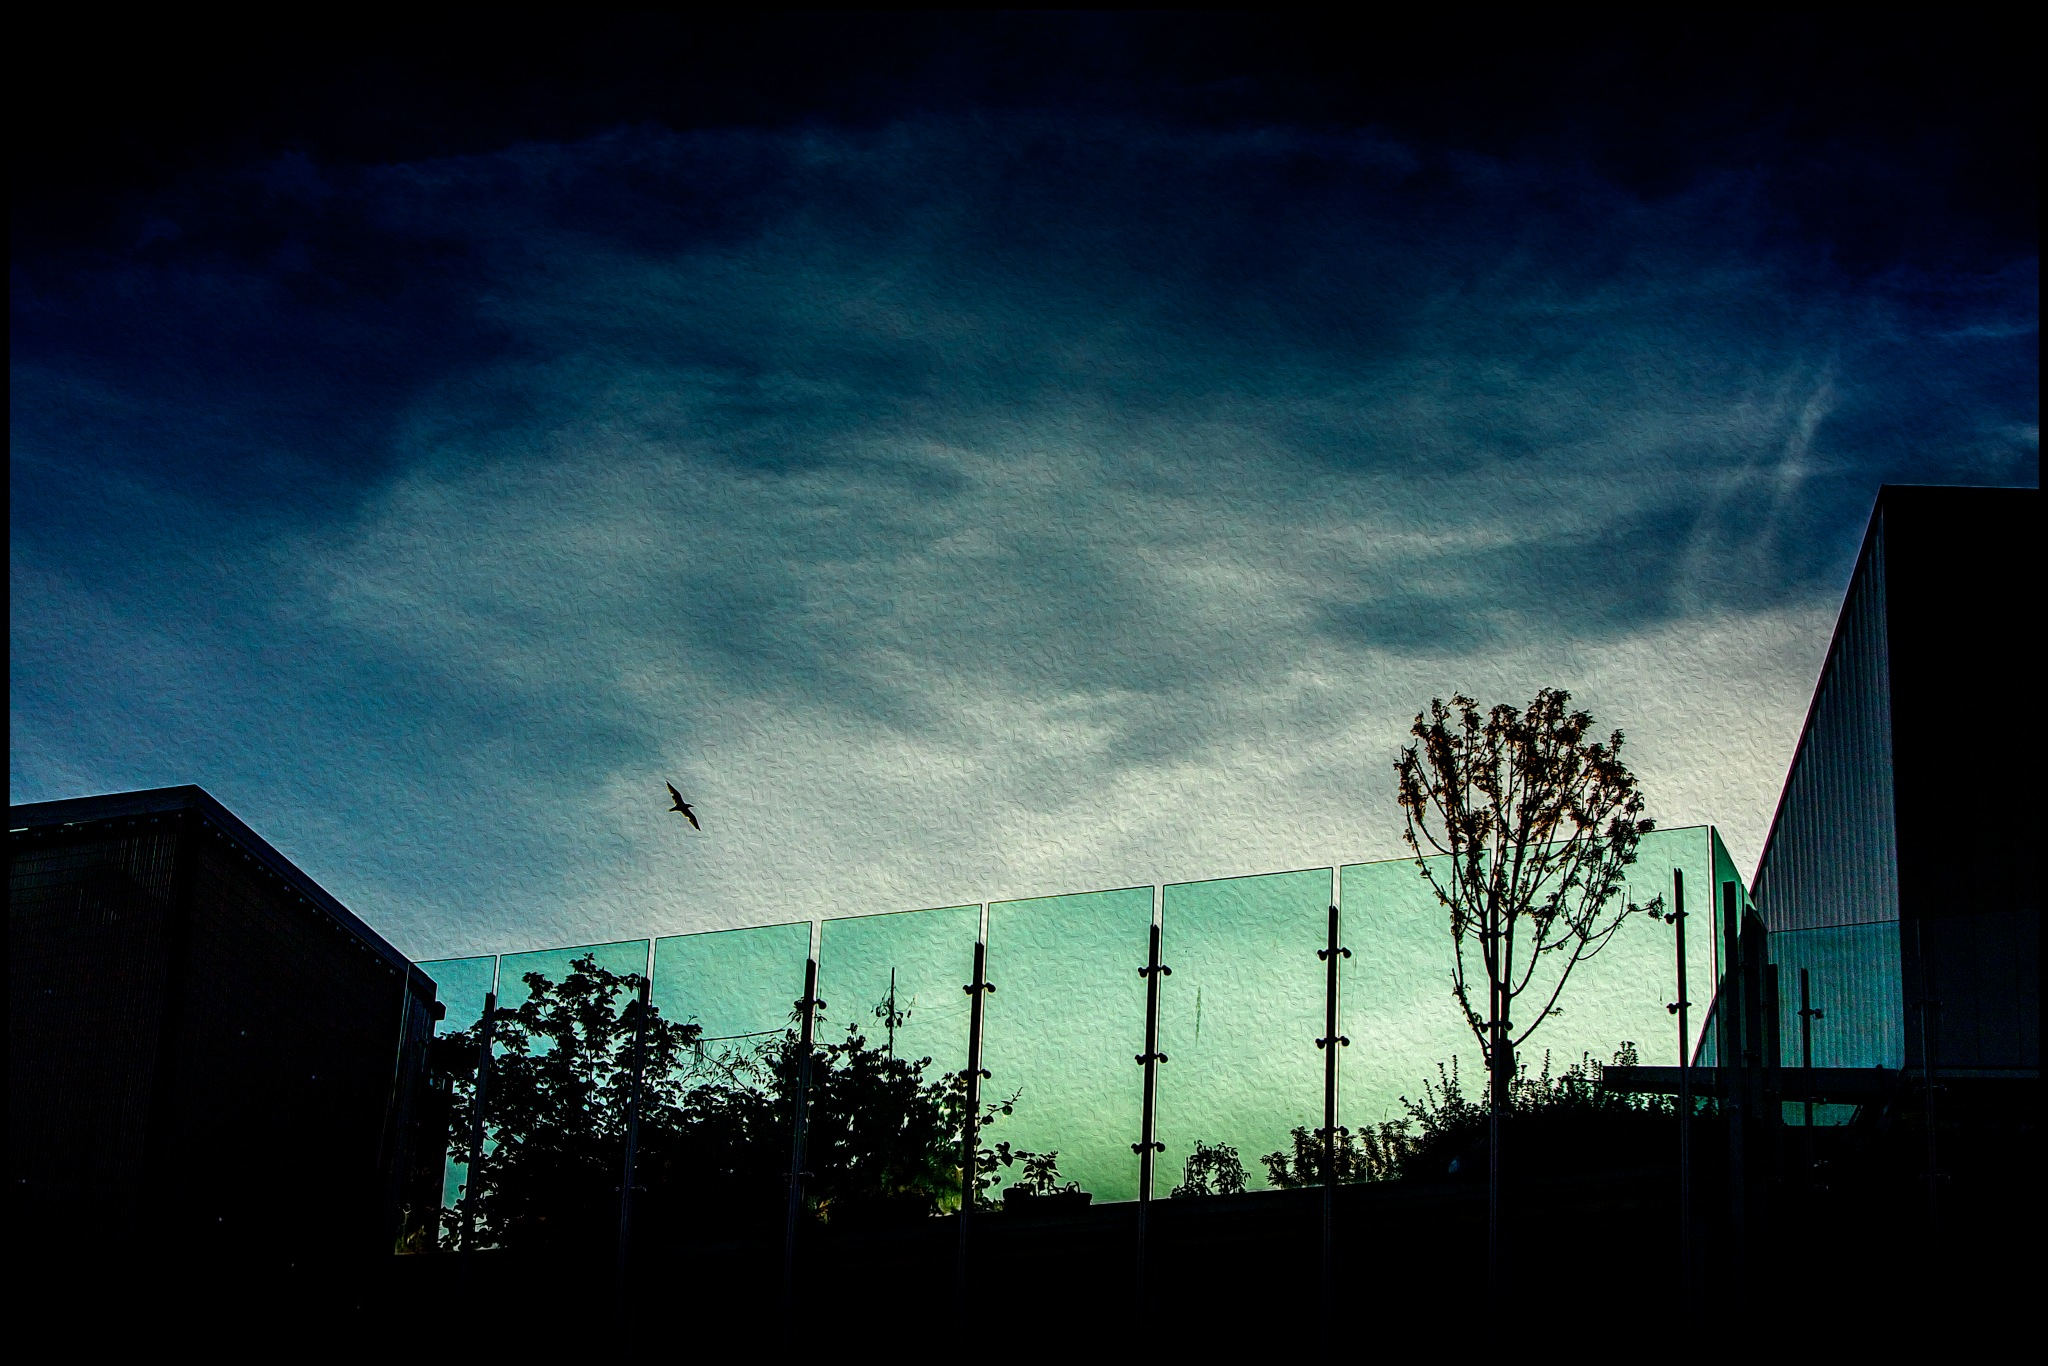 Bird and Glass by Alwyn Kumst